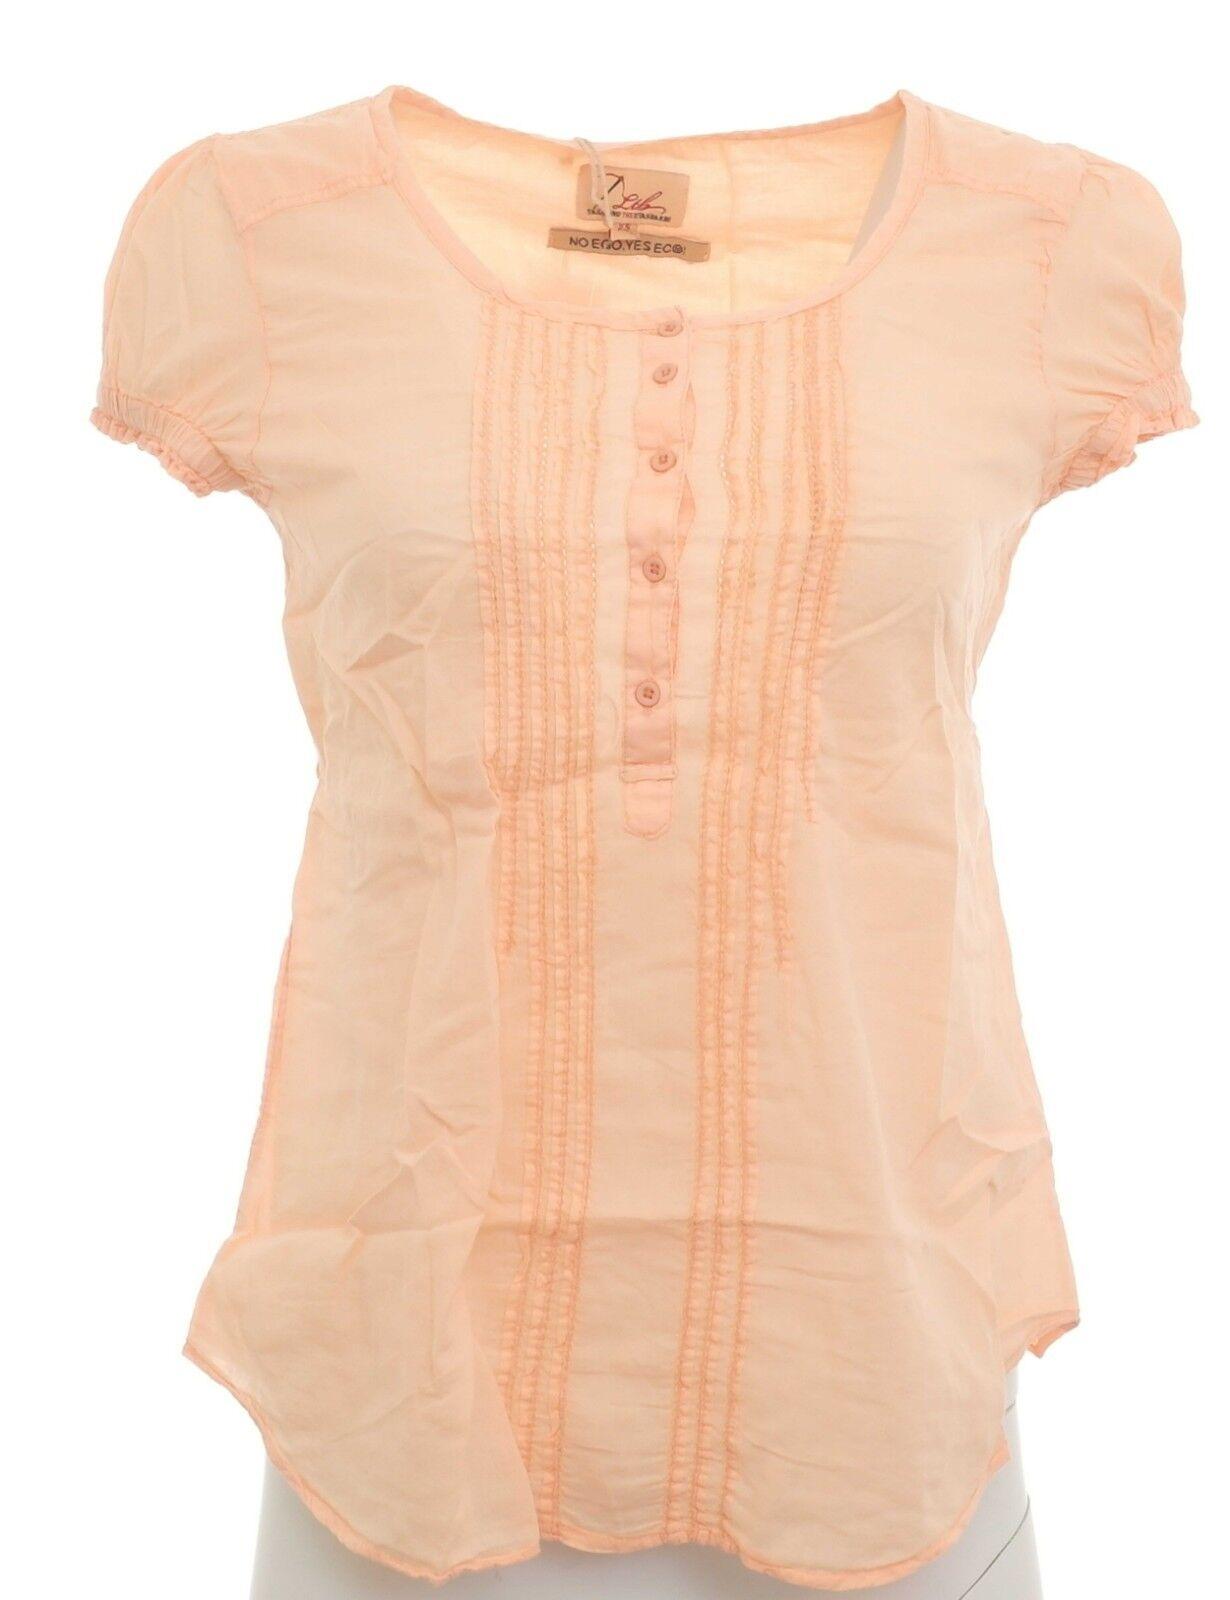 bieten Rabatte neue Season offizielle Bilder LTB Bluse Tunika Longbluse Hemd Shirt Top T-Shirt Orange Baumwolle 872633